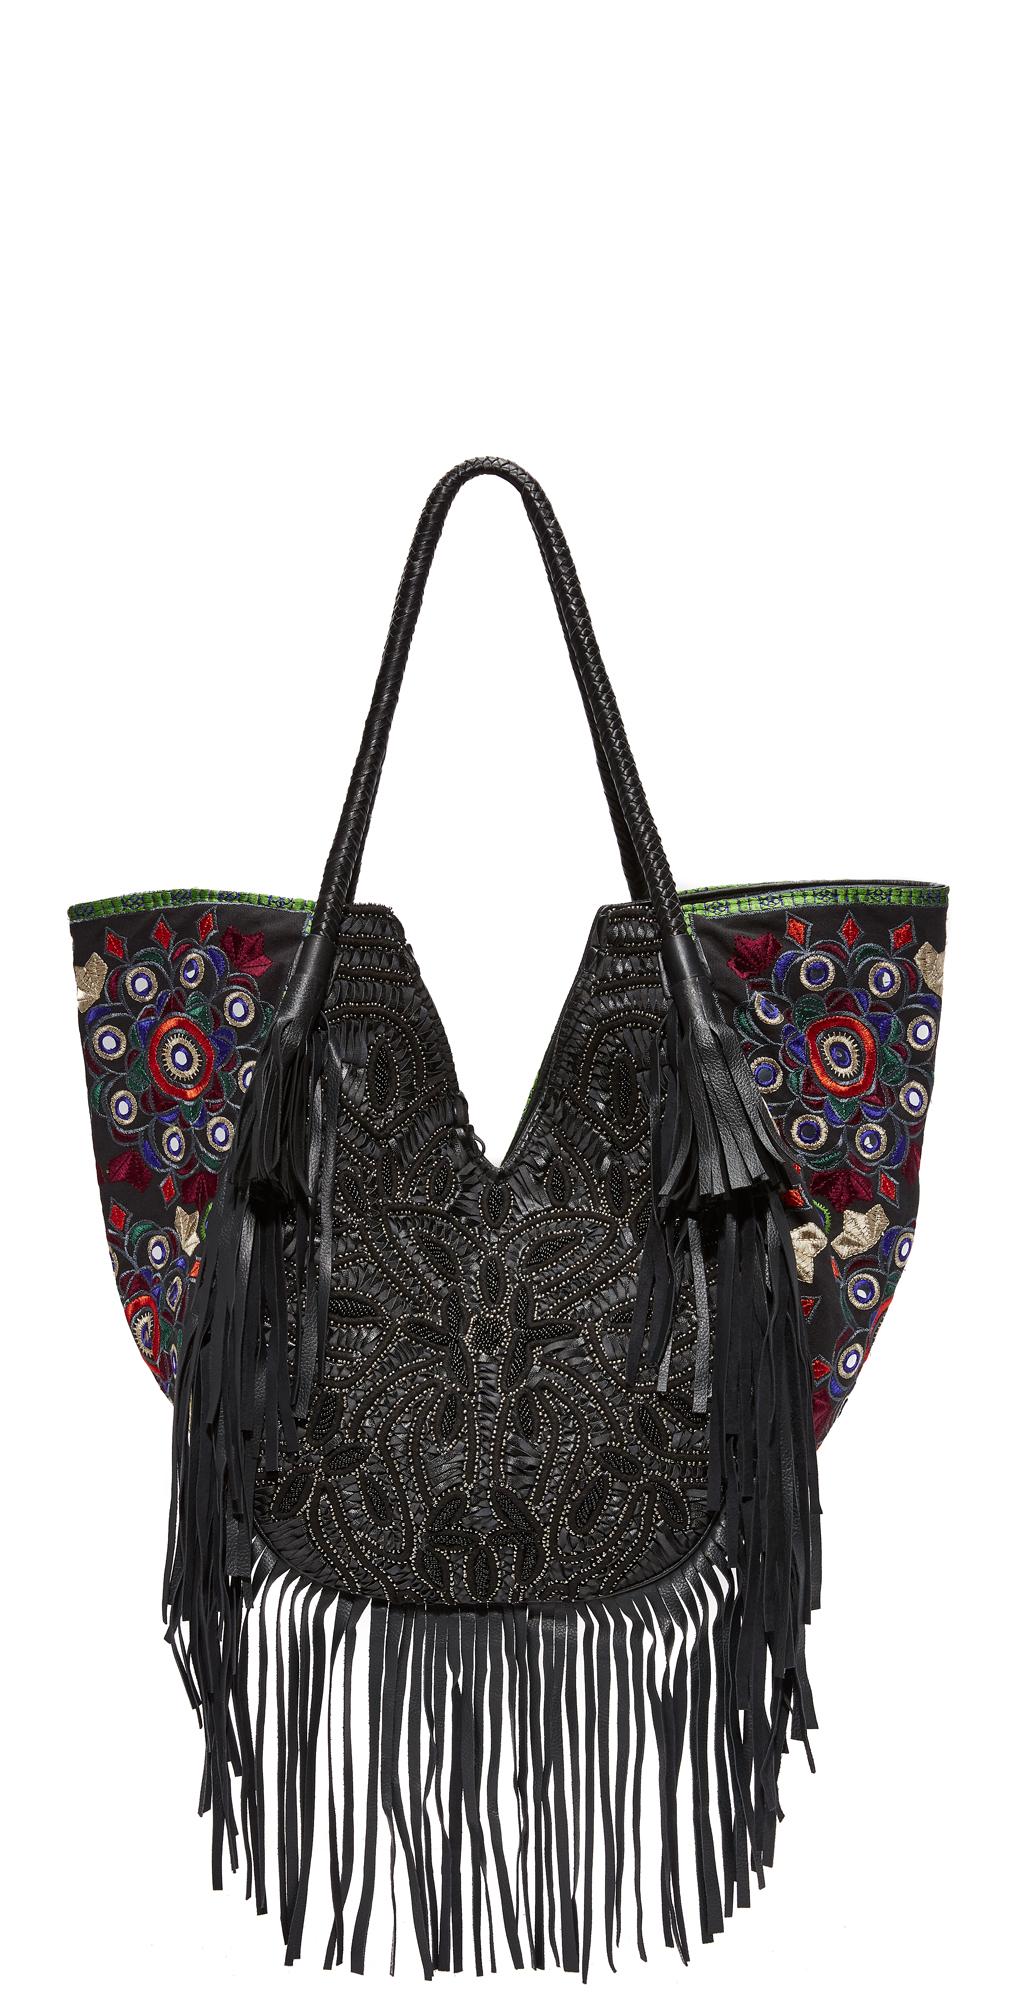 Nally Bag Antik Batik